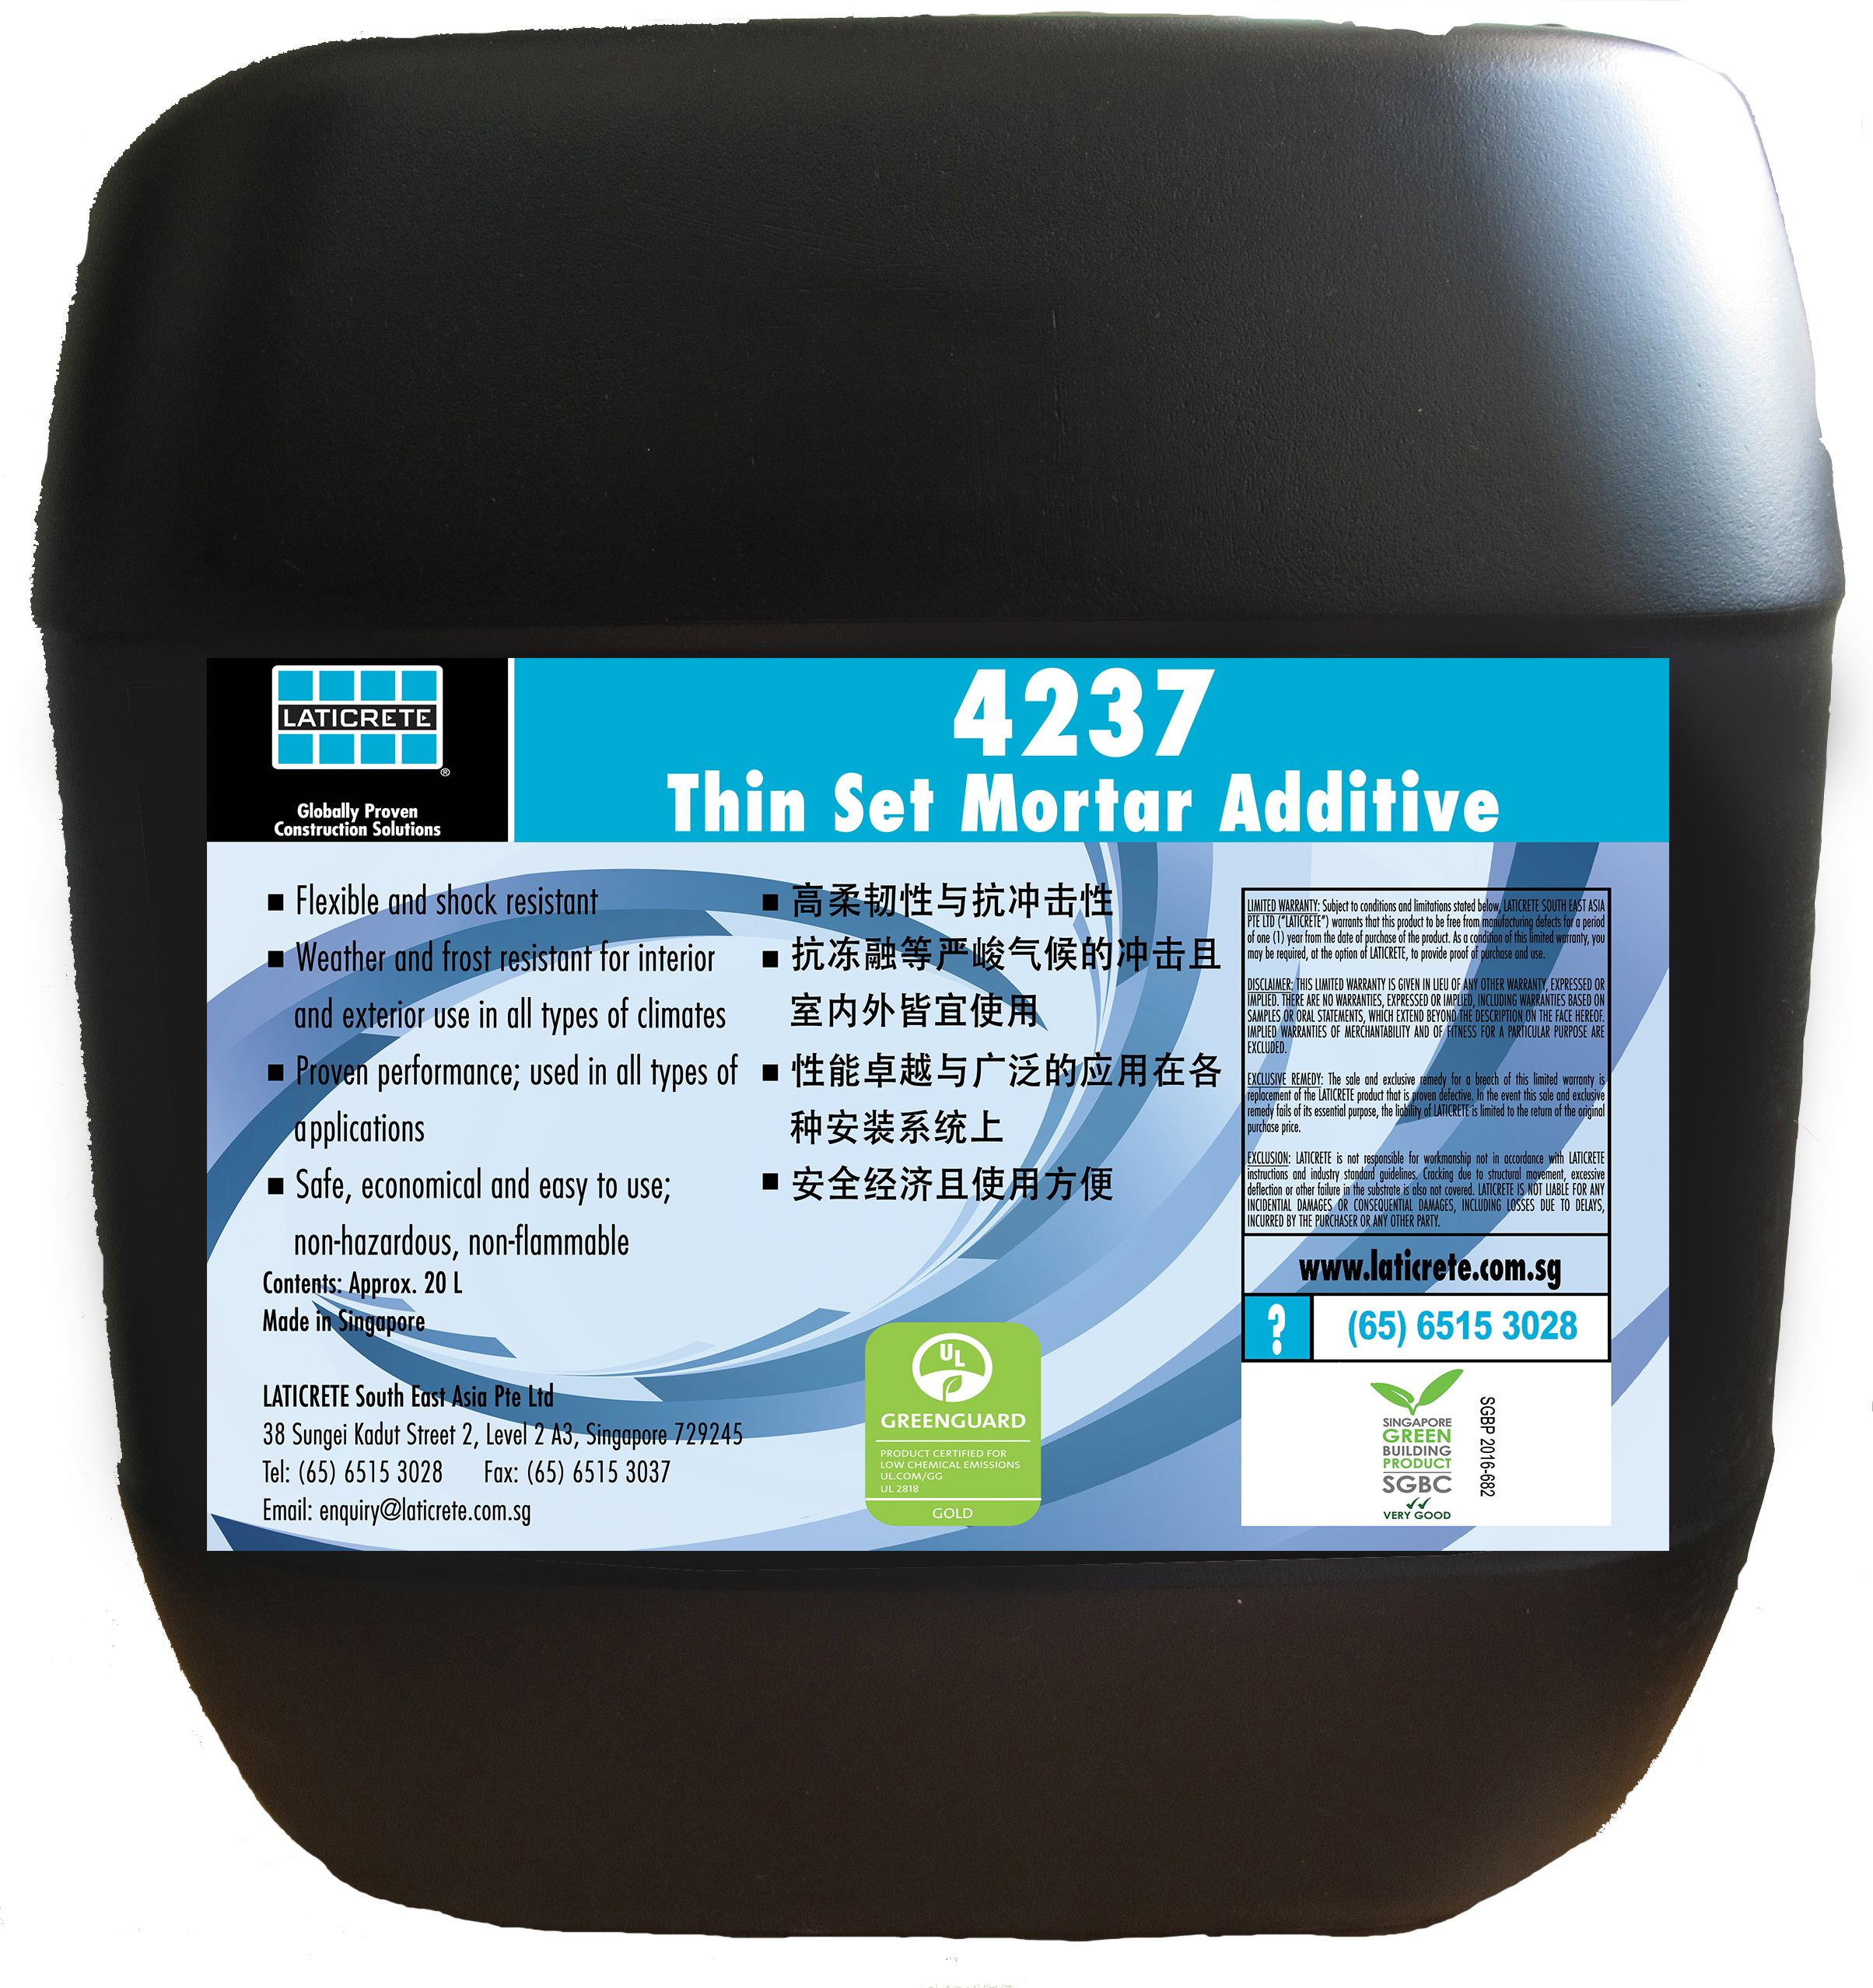 4237 Thin Set Mortar Additive